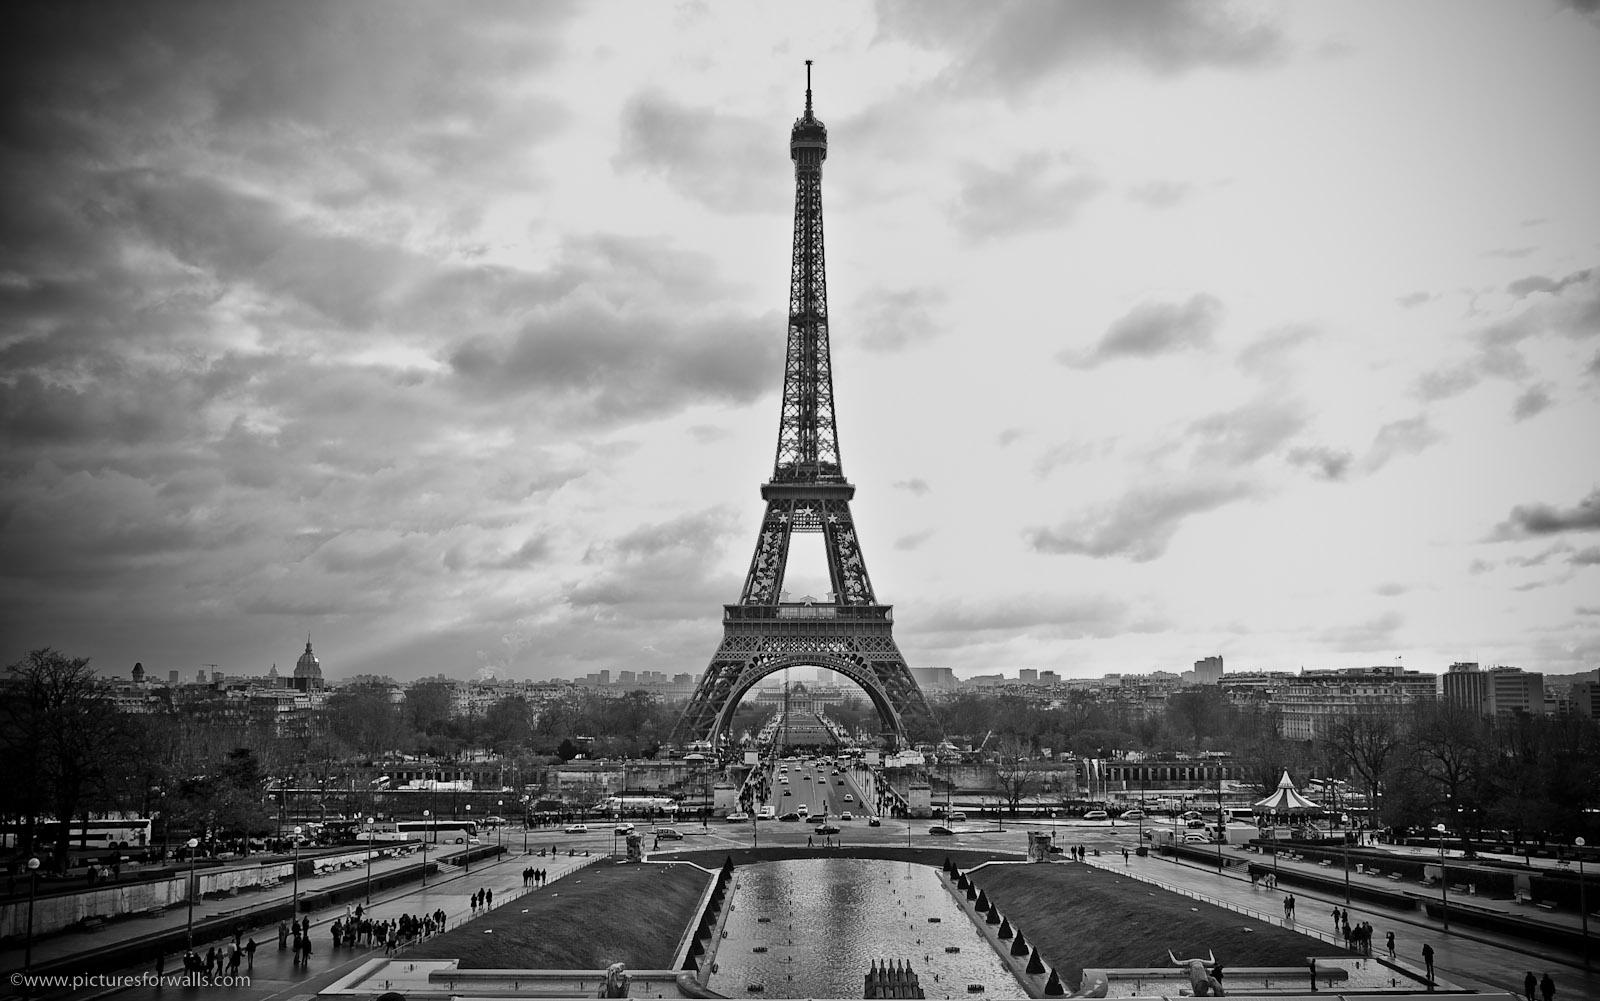 Eiffel Tower Paris wallpapers and desktop backgrounds 1600x1001